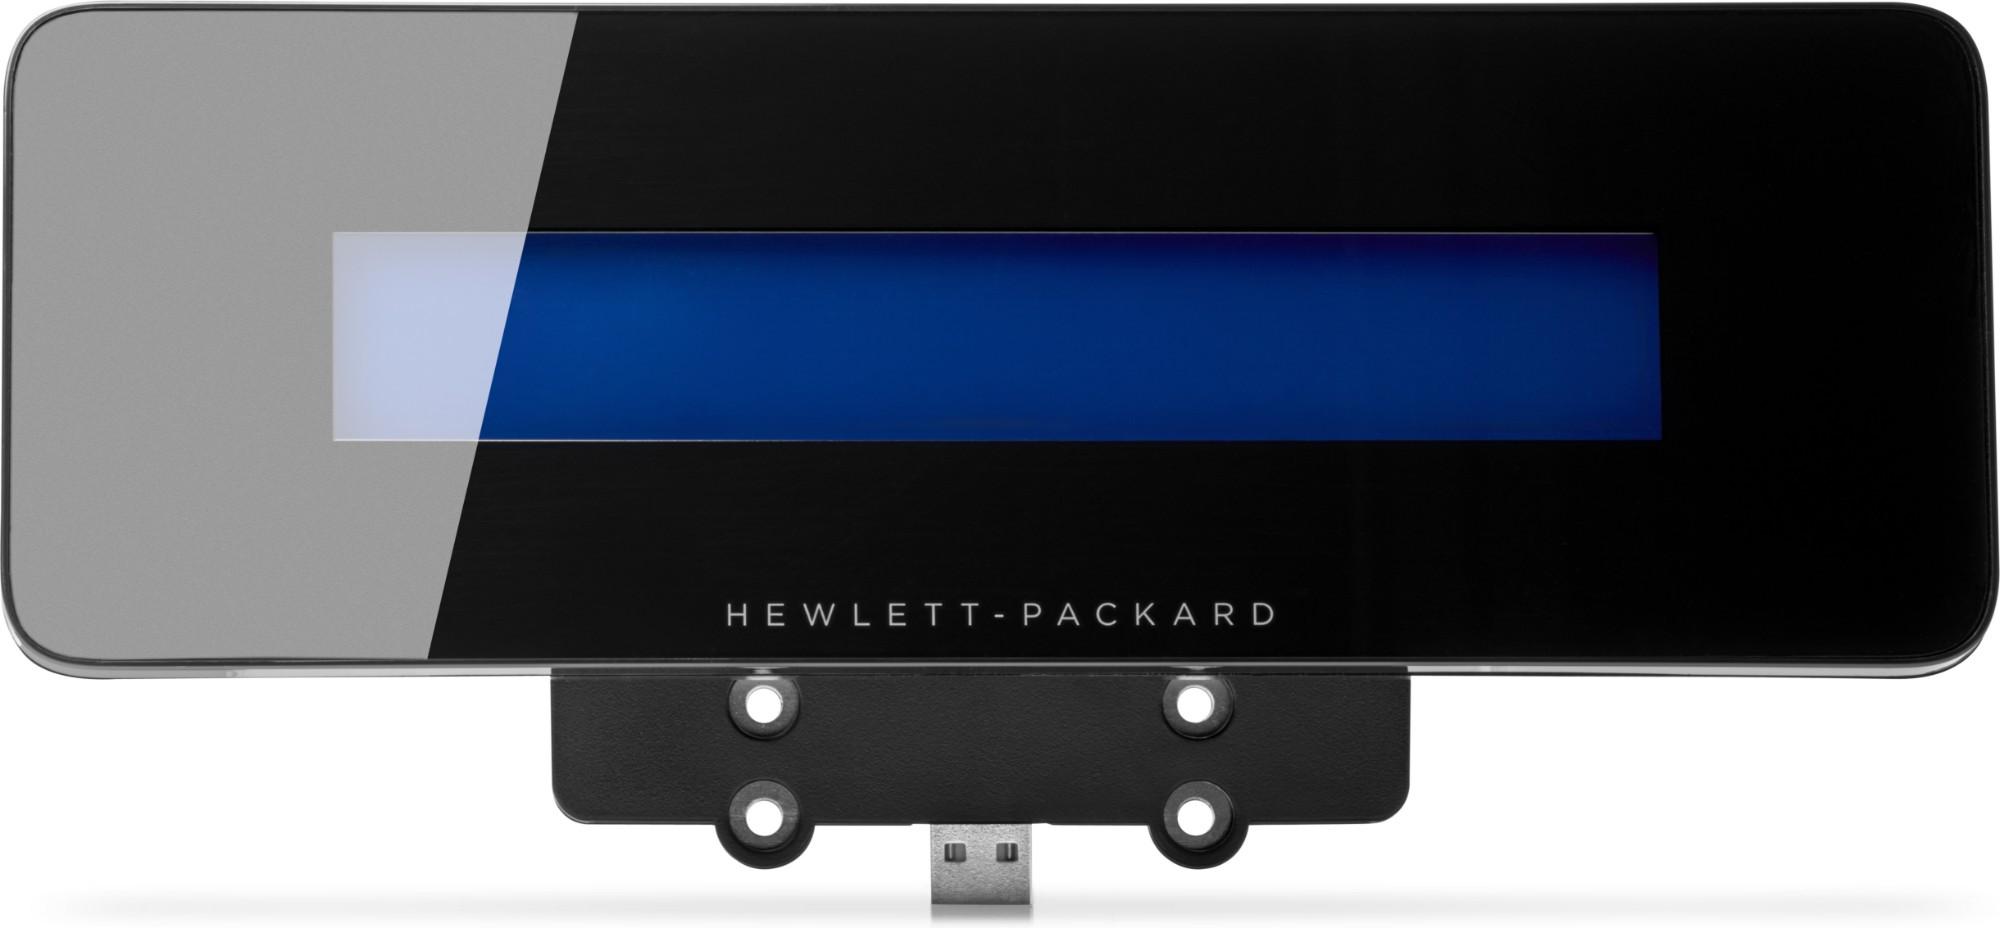 HP ElitePOS Top Mount 2x20 CFD 20 cijfers USB 2.0 Zwart